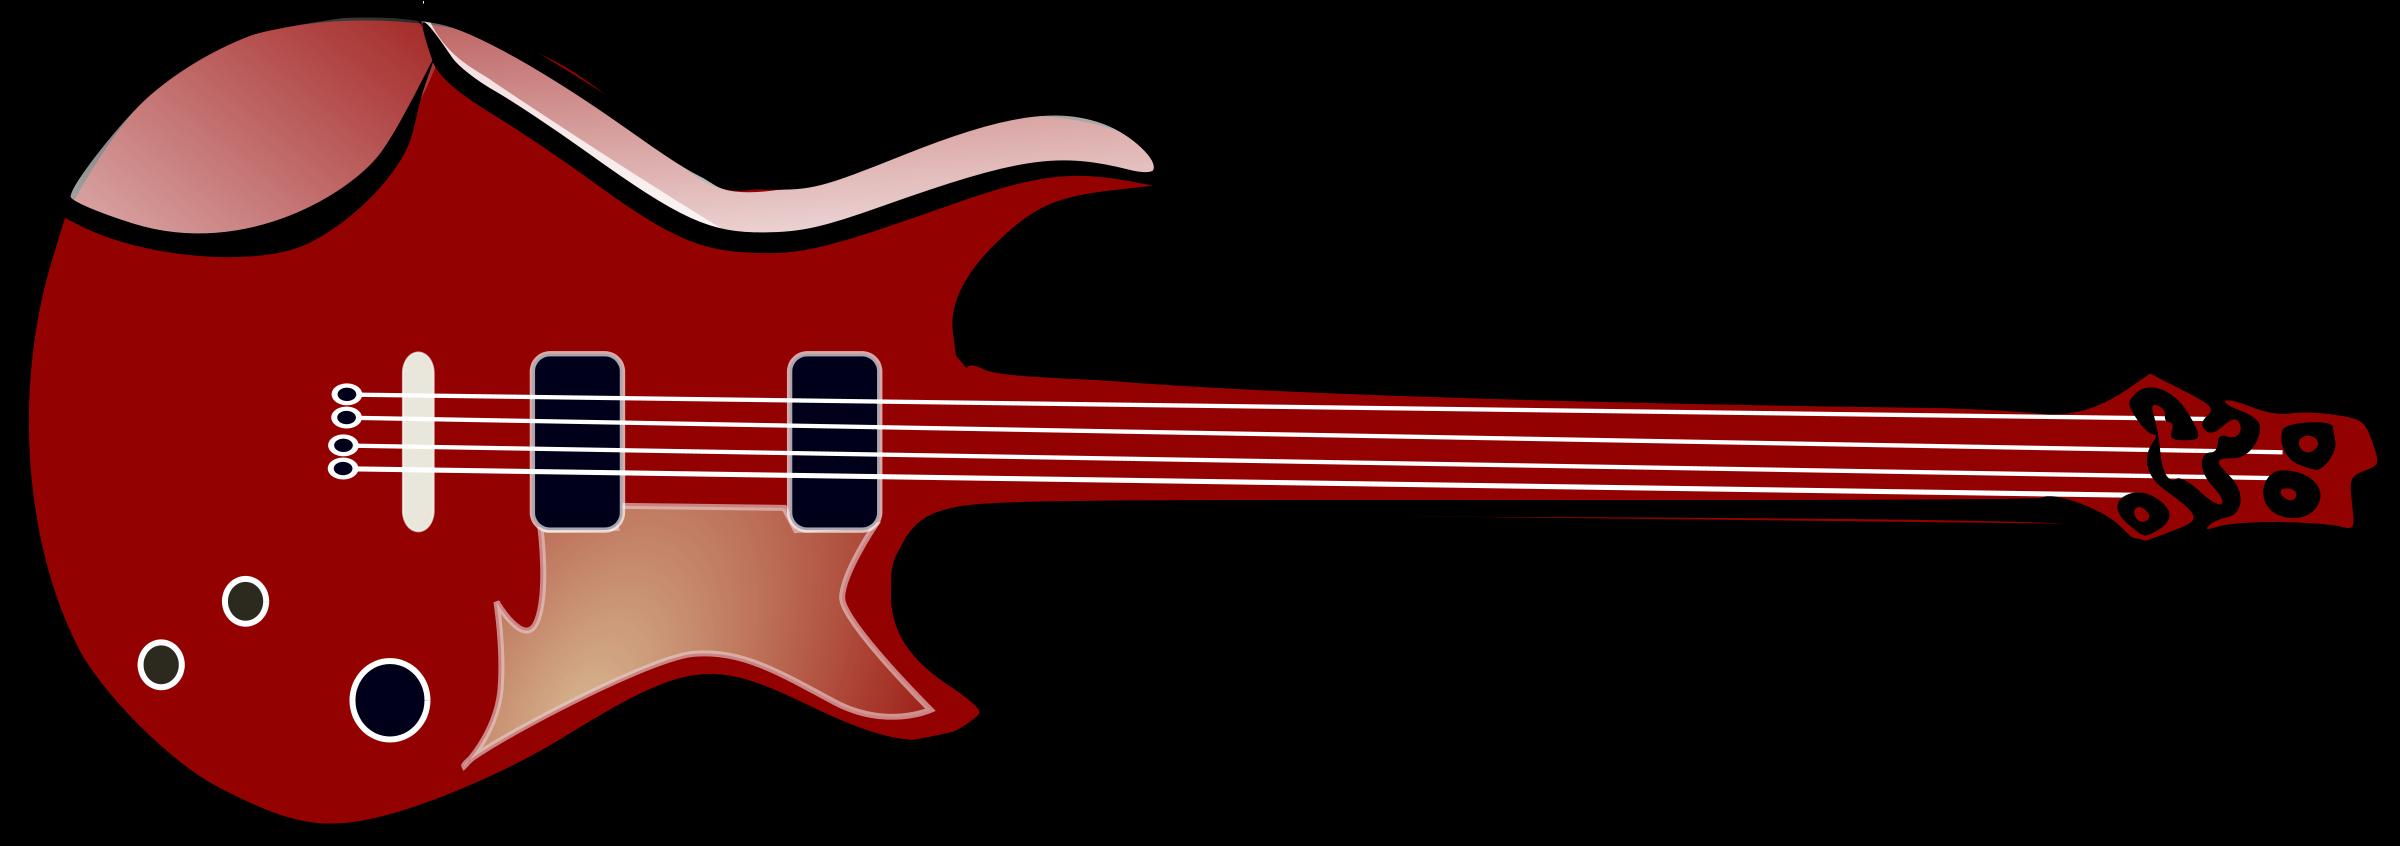 Bass panda free images. Clipart guitar jpeg